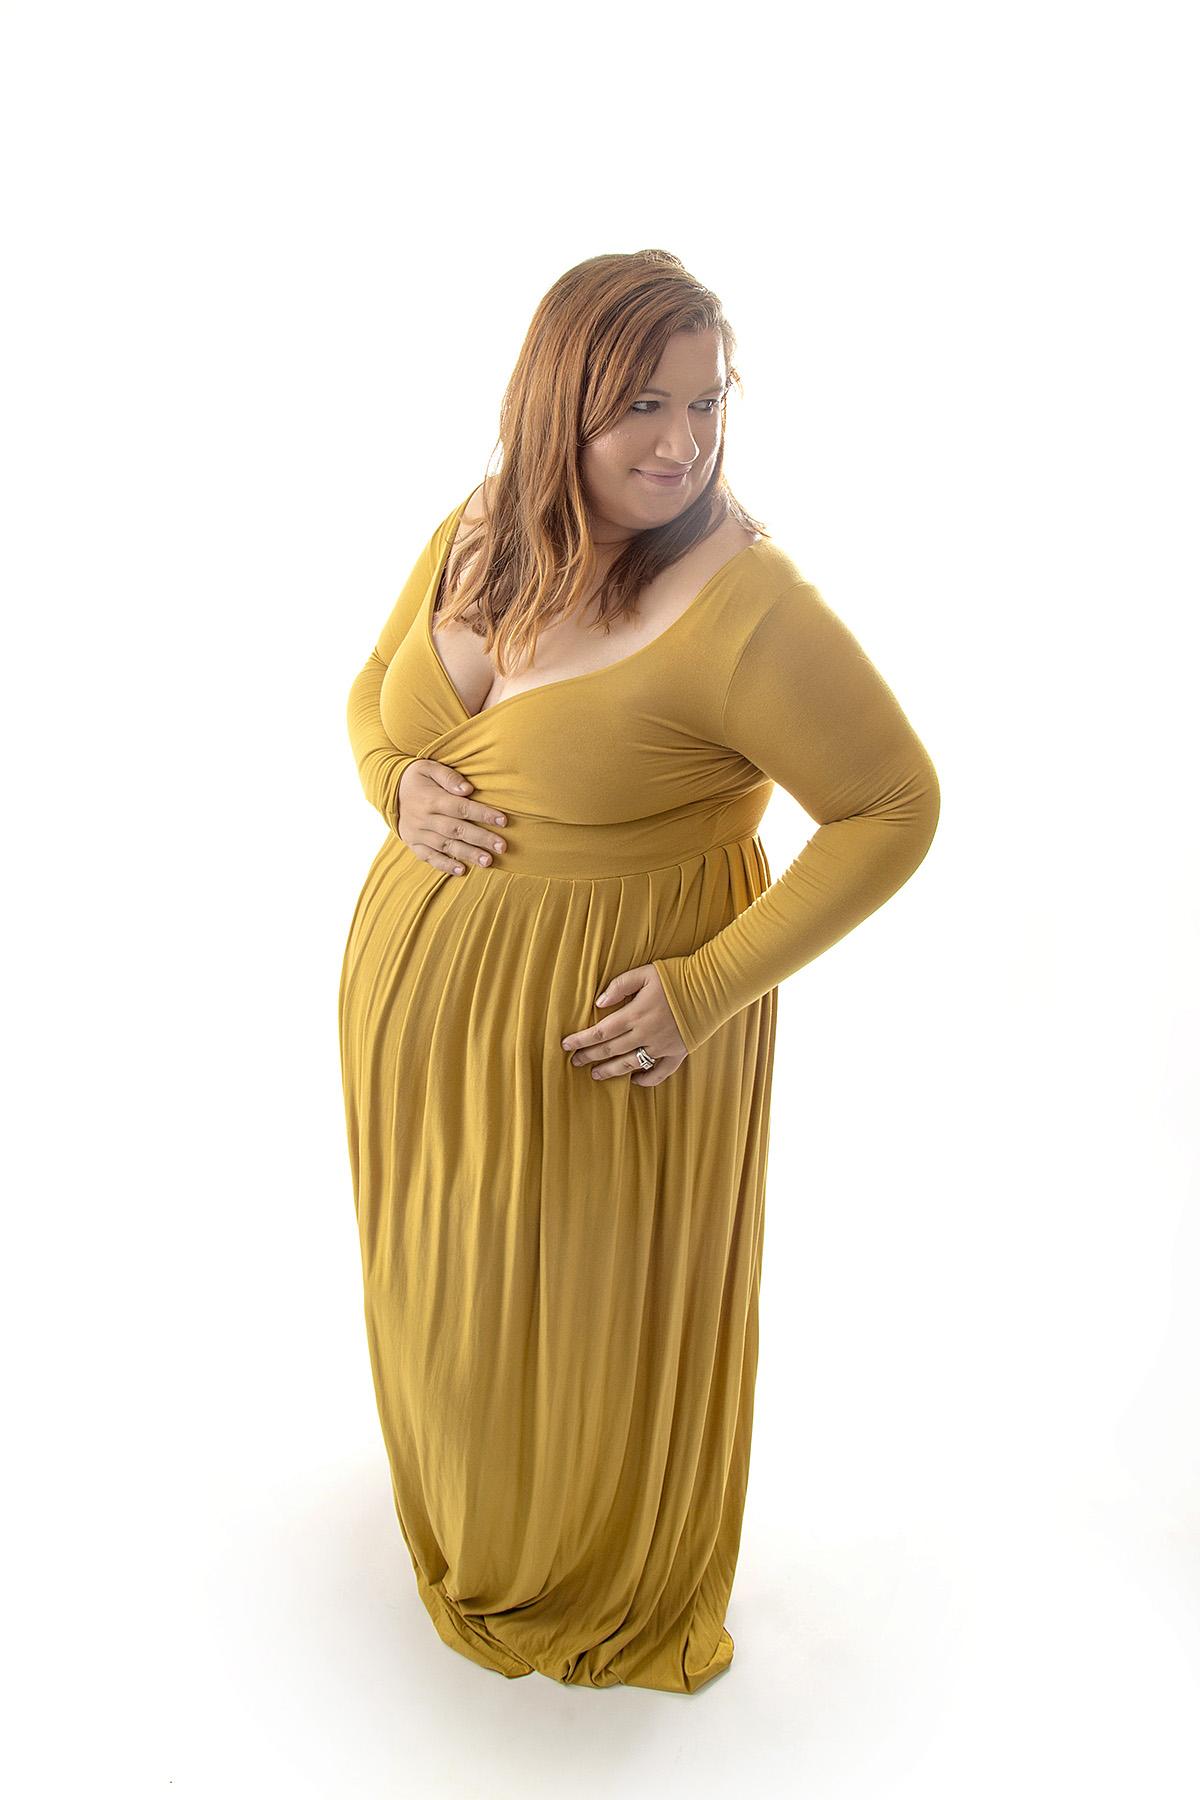 Angie_Englerth_Lancater_Maternity_Photographer_Wardobe_Yellow_003.jpg